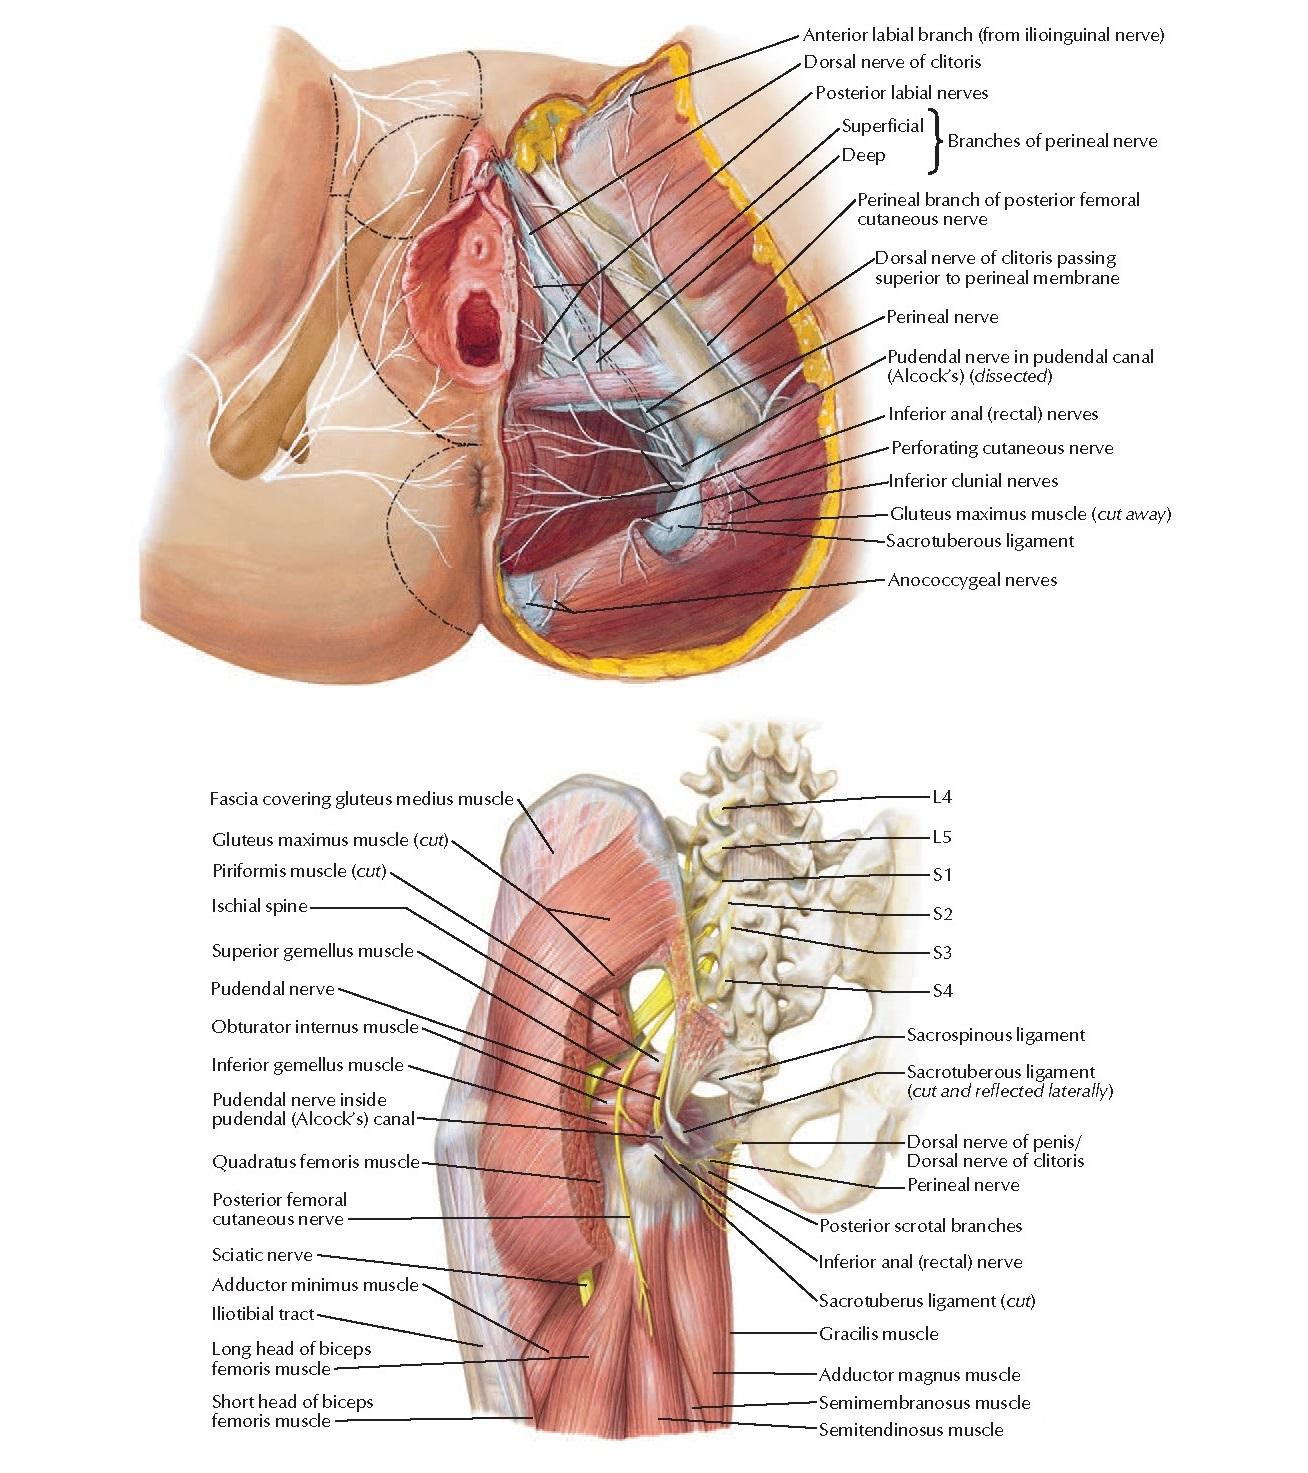 Nerves of Perineum and External Genitalia: Female Anatomy